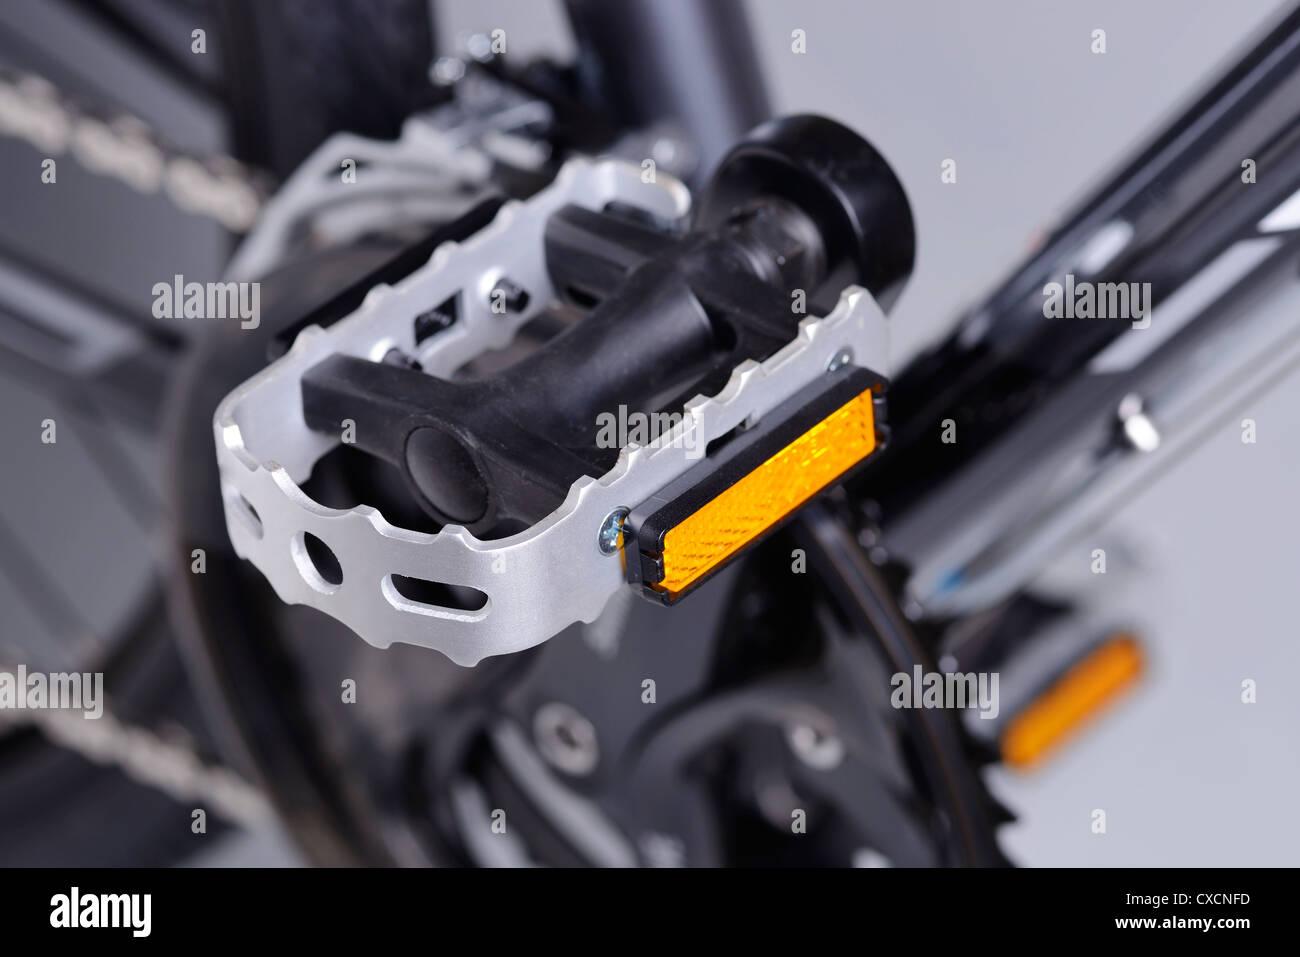 Bicycle platform pedal close up - Stock Image